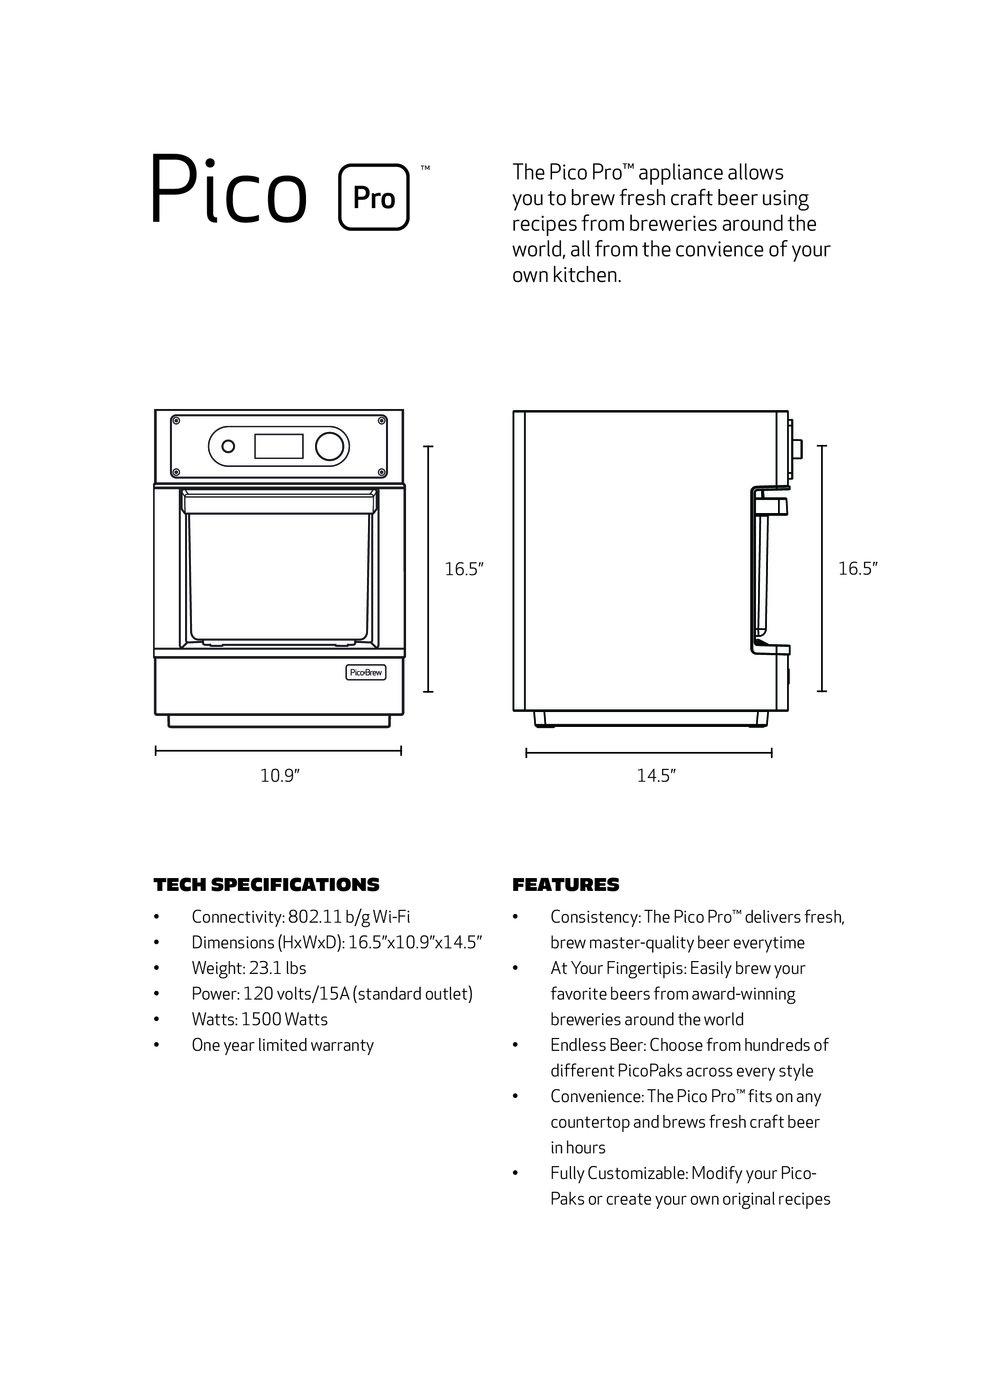 Pico_Infographic-02.jpg